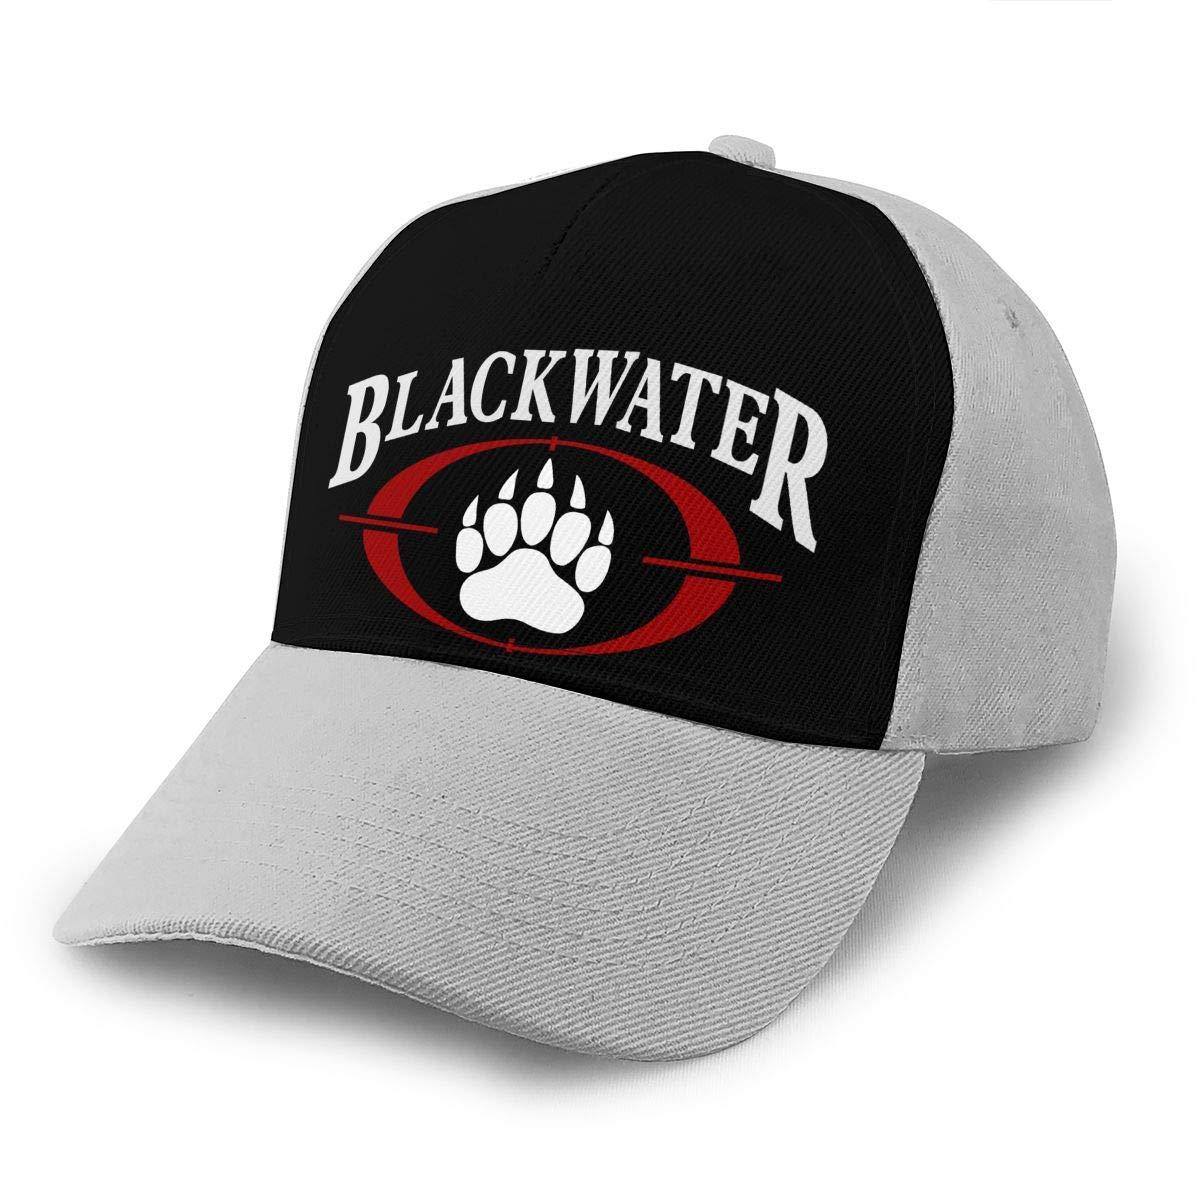 Adjustable Women Men Blackwater-Logo Print Baseball Cap Flat Brim Cap Hats Hip Hop Snapback Sun Hat Boys Girls Gray by Apolonia